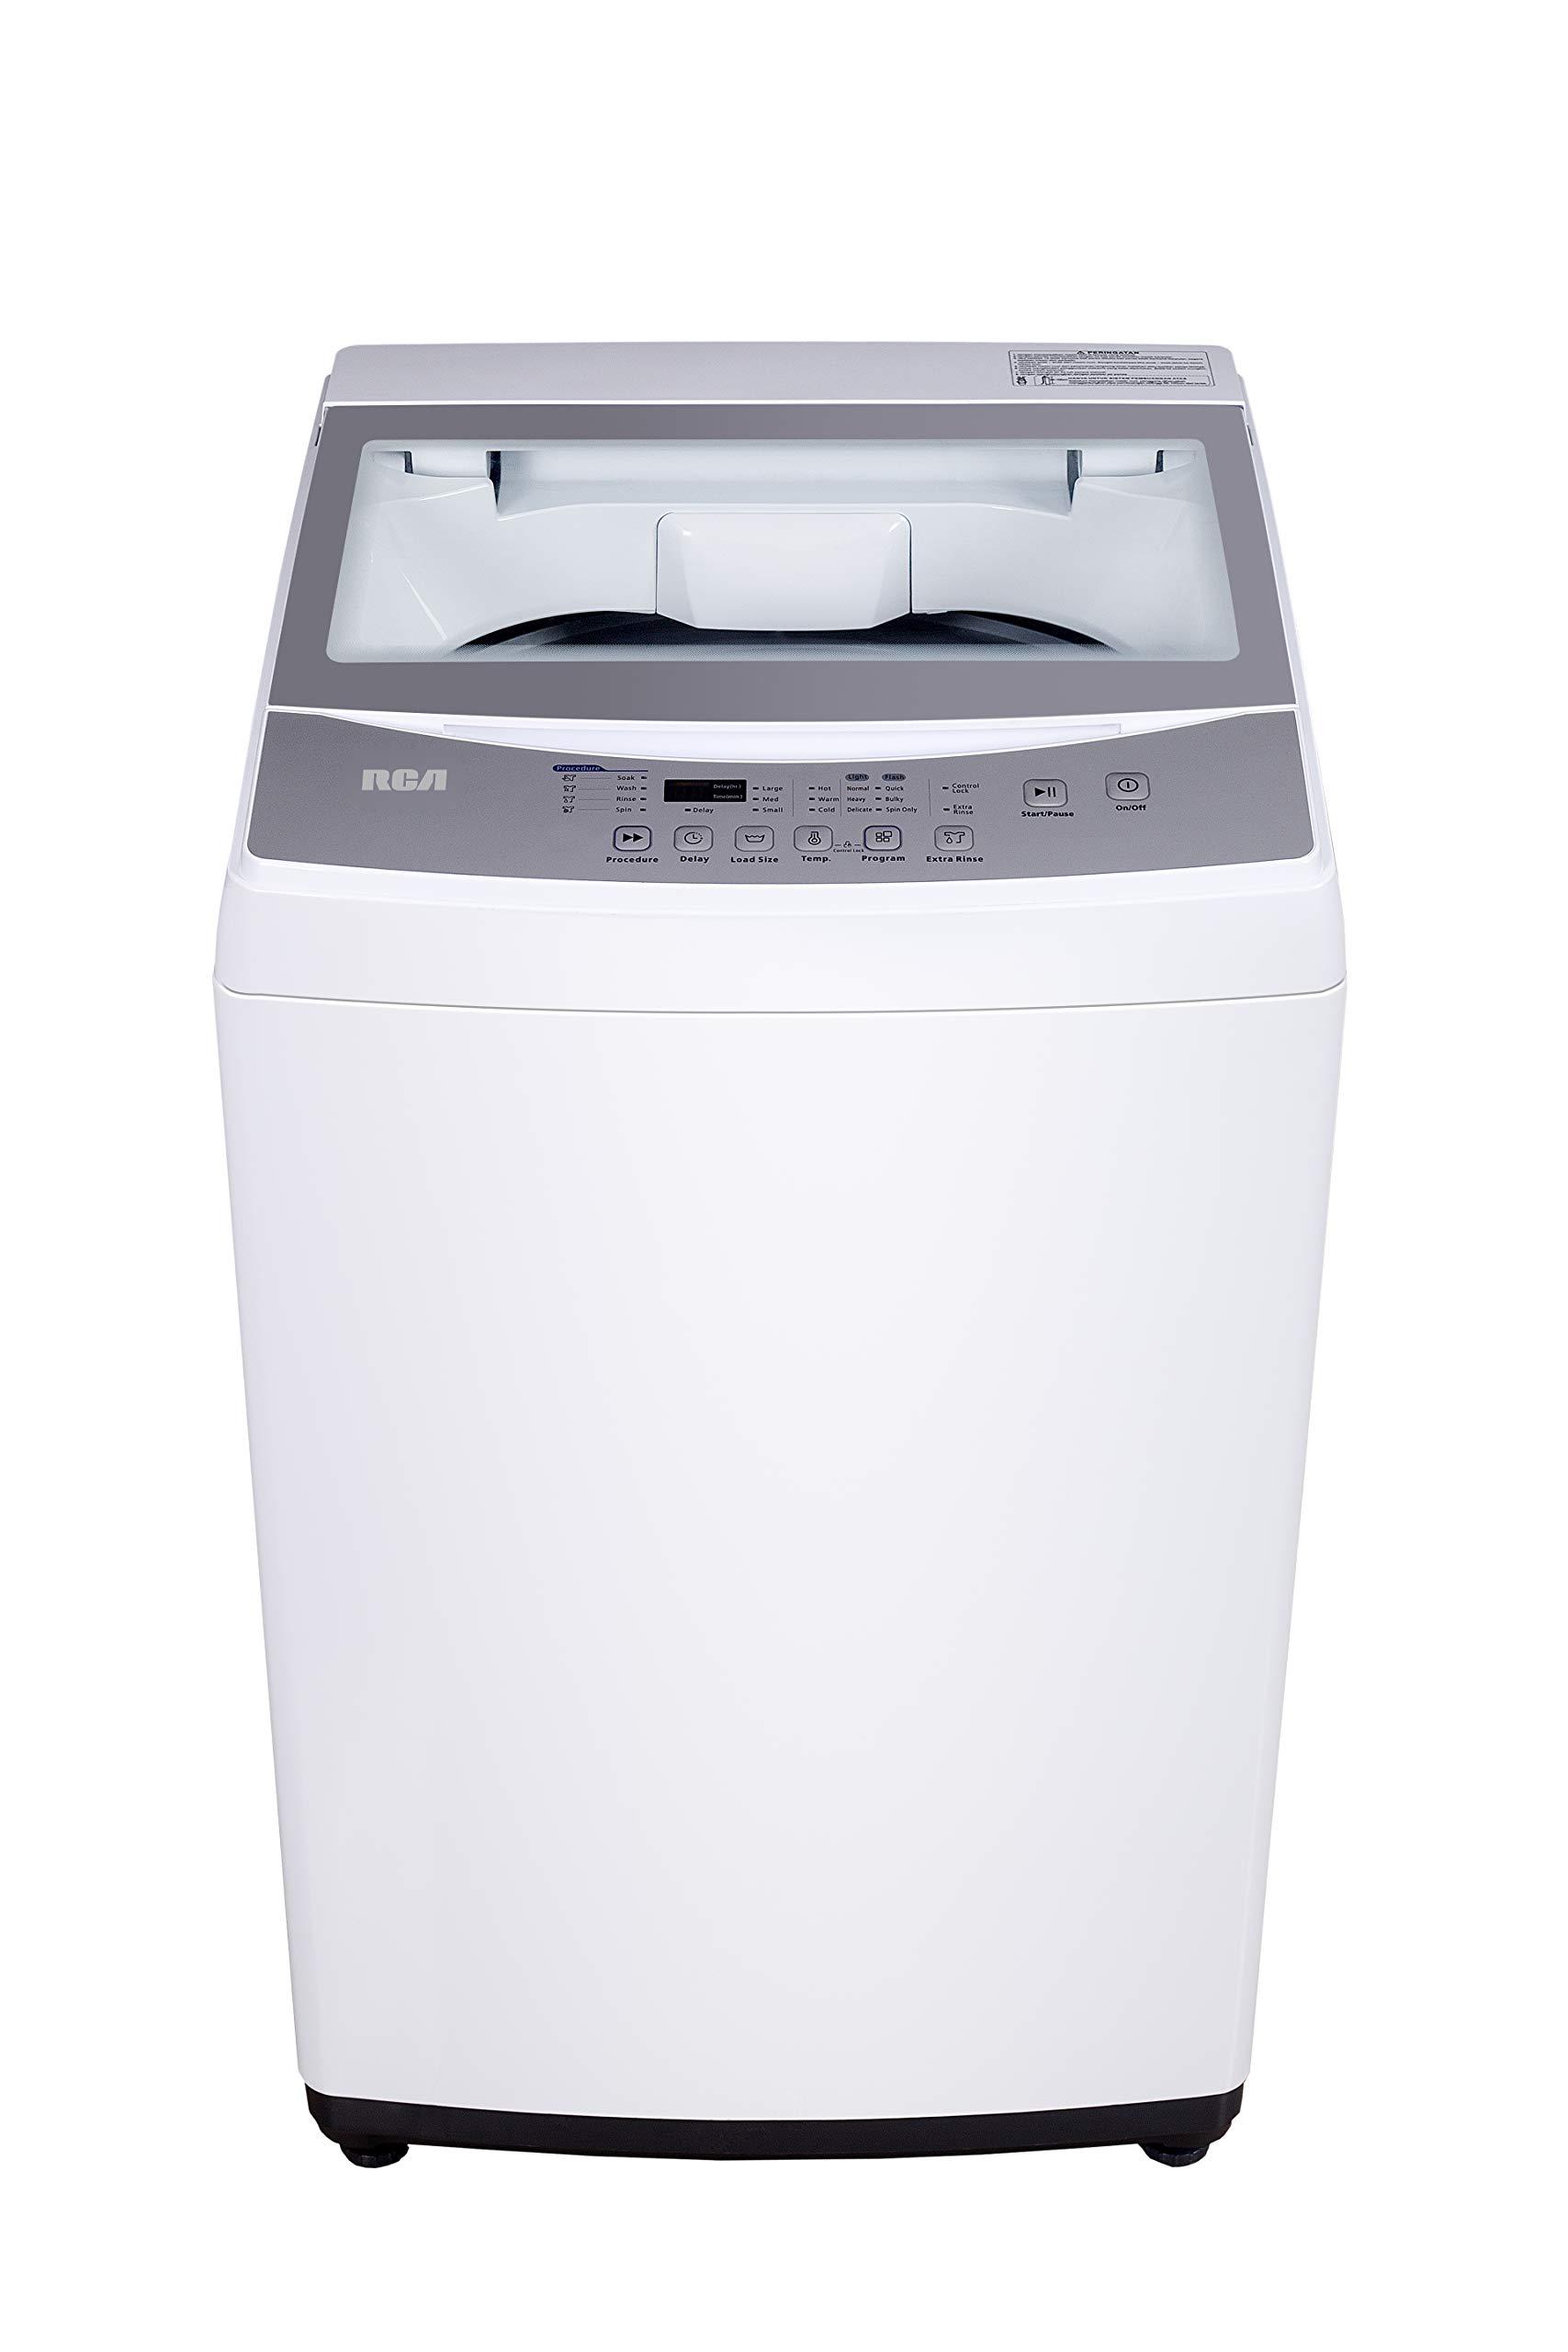 RCA RPW302 Portable Washing Machine, White